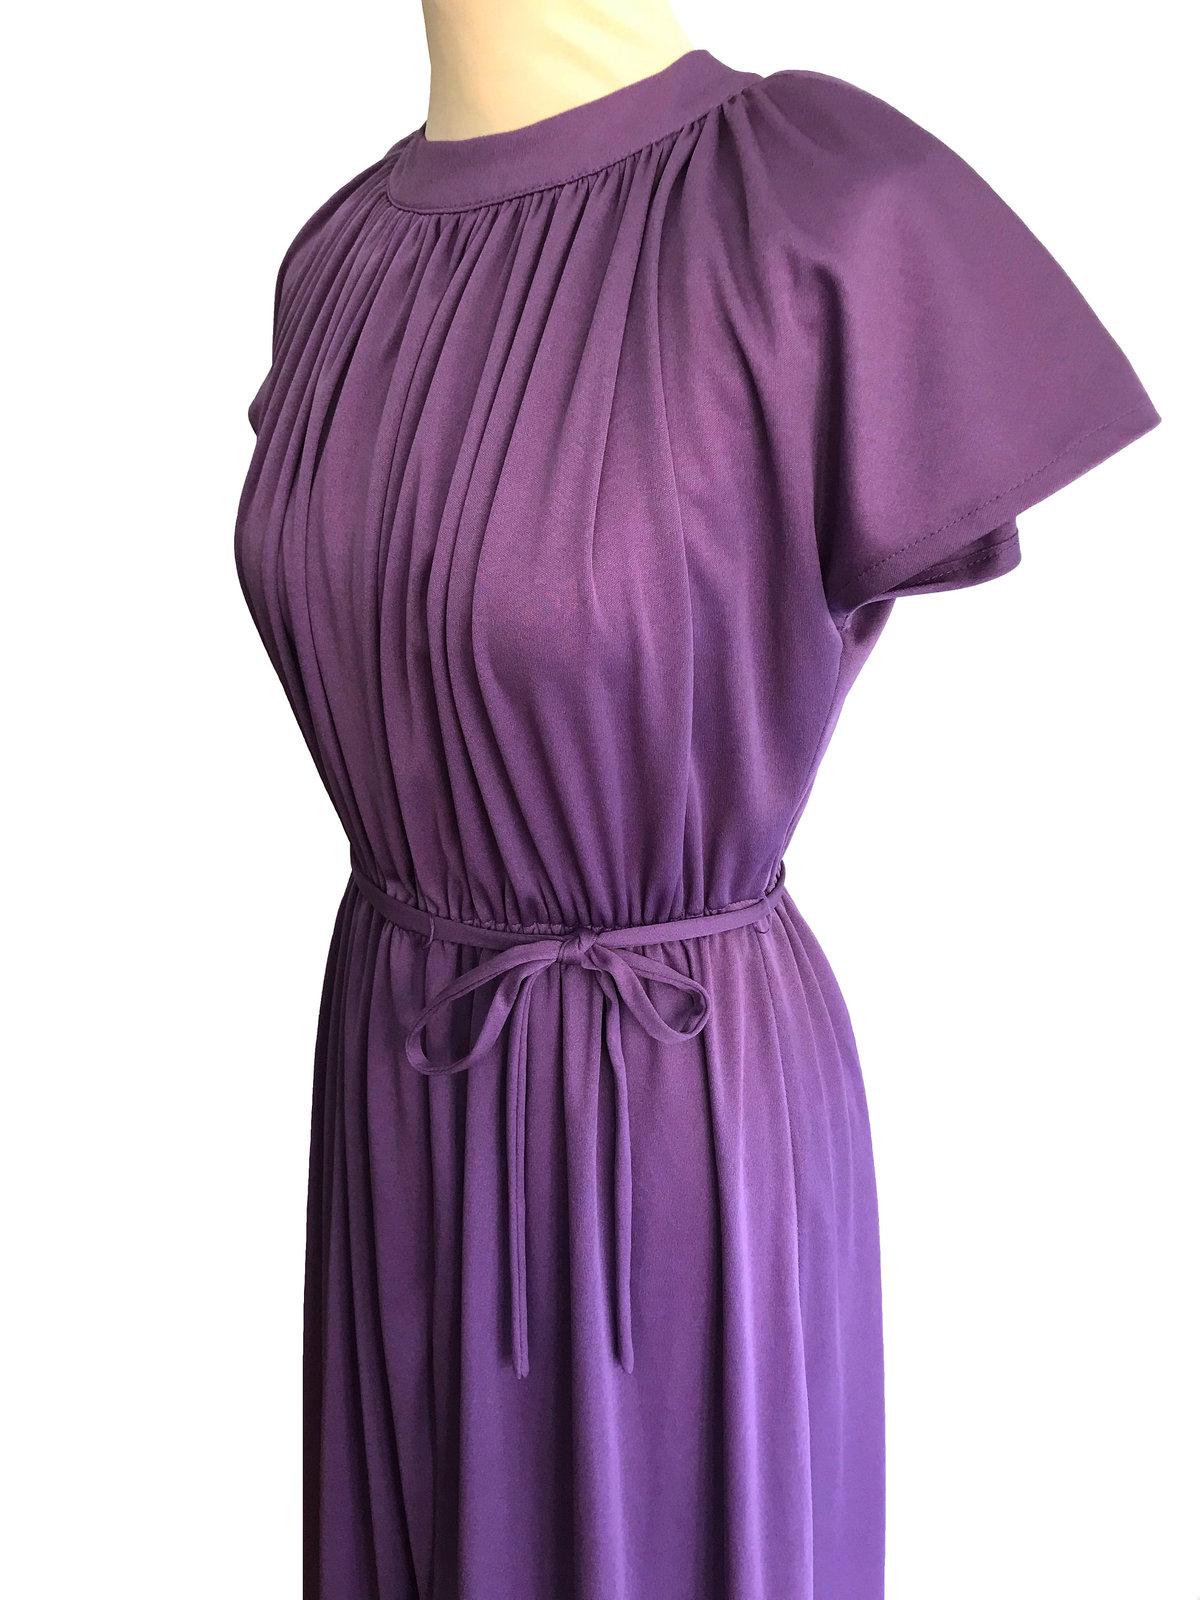 70s Lavender Plum Heather Grecian Style Ruched Draped Tunic Raglan Kimono Sleeve image 5